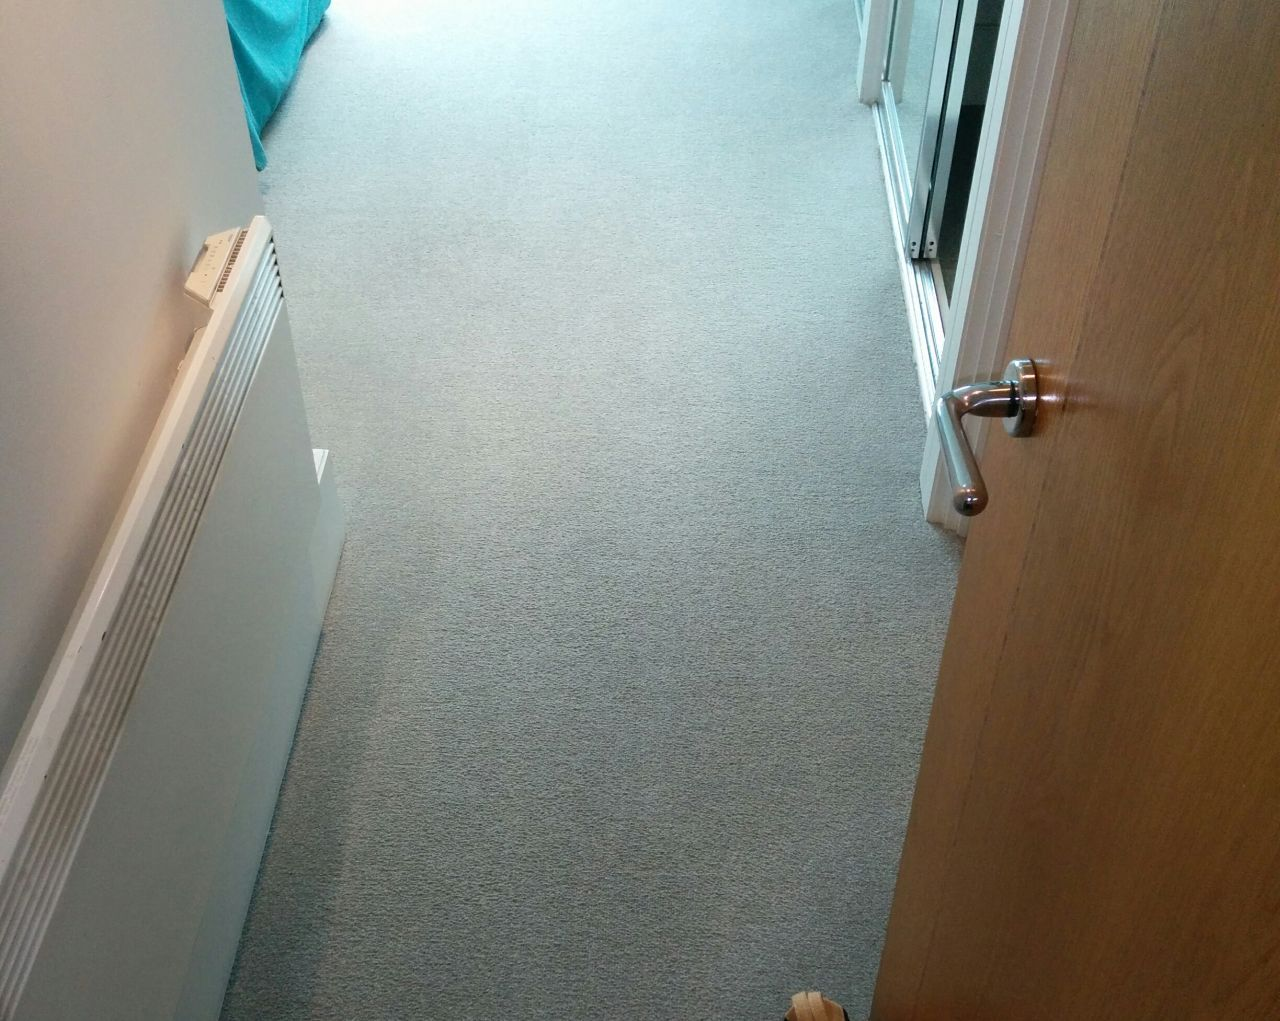 CR9 sofa cleaners Croydon